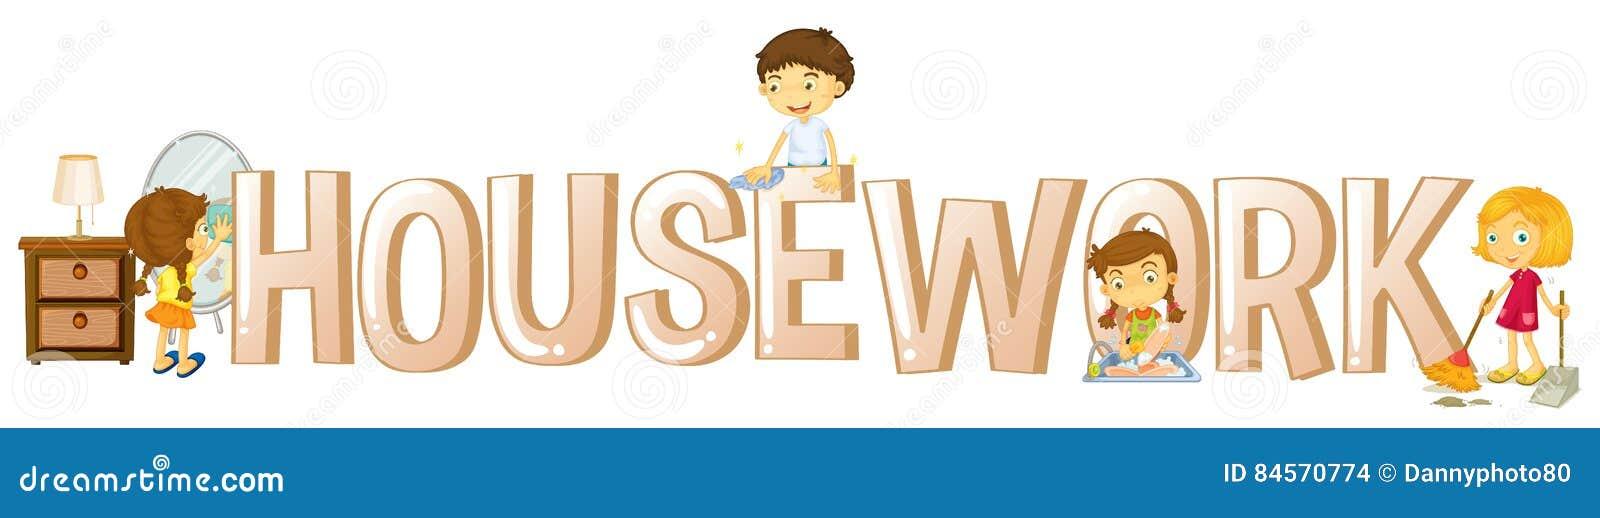 Wordcard Design Word Windmill on Gardening Vocabulary Words